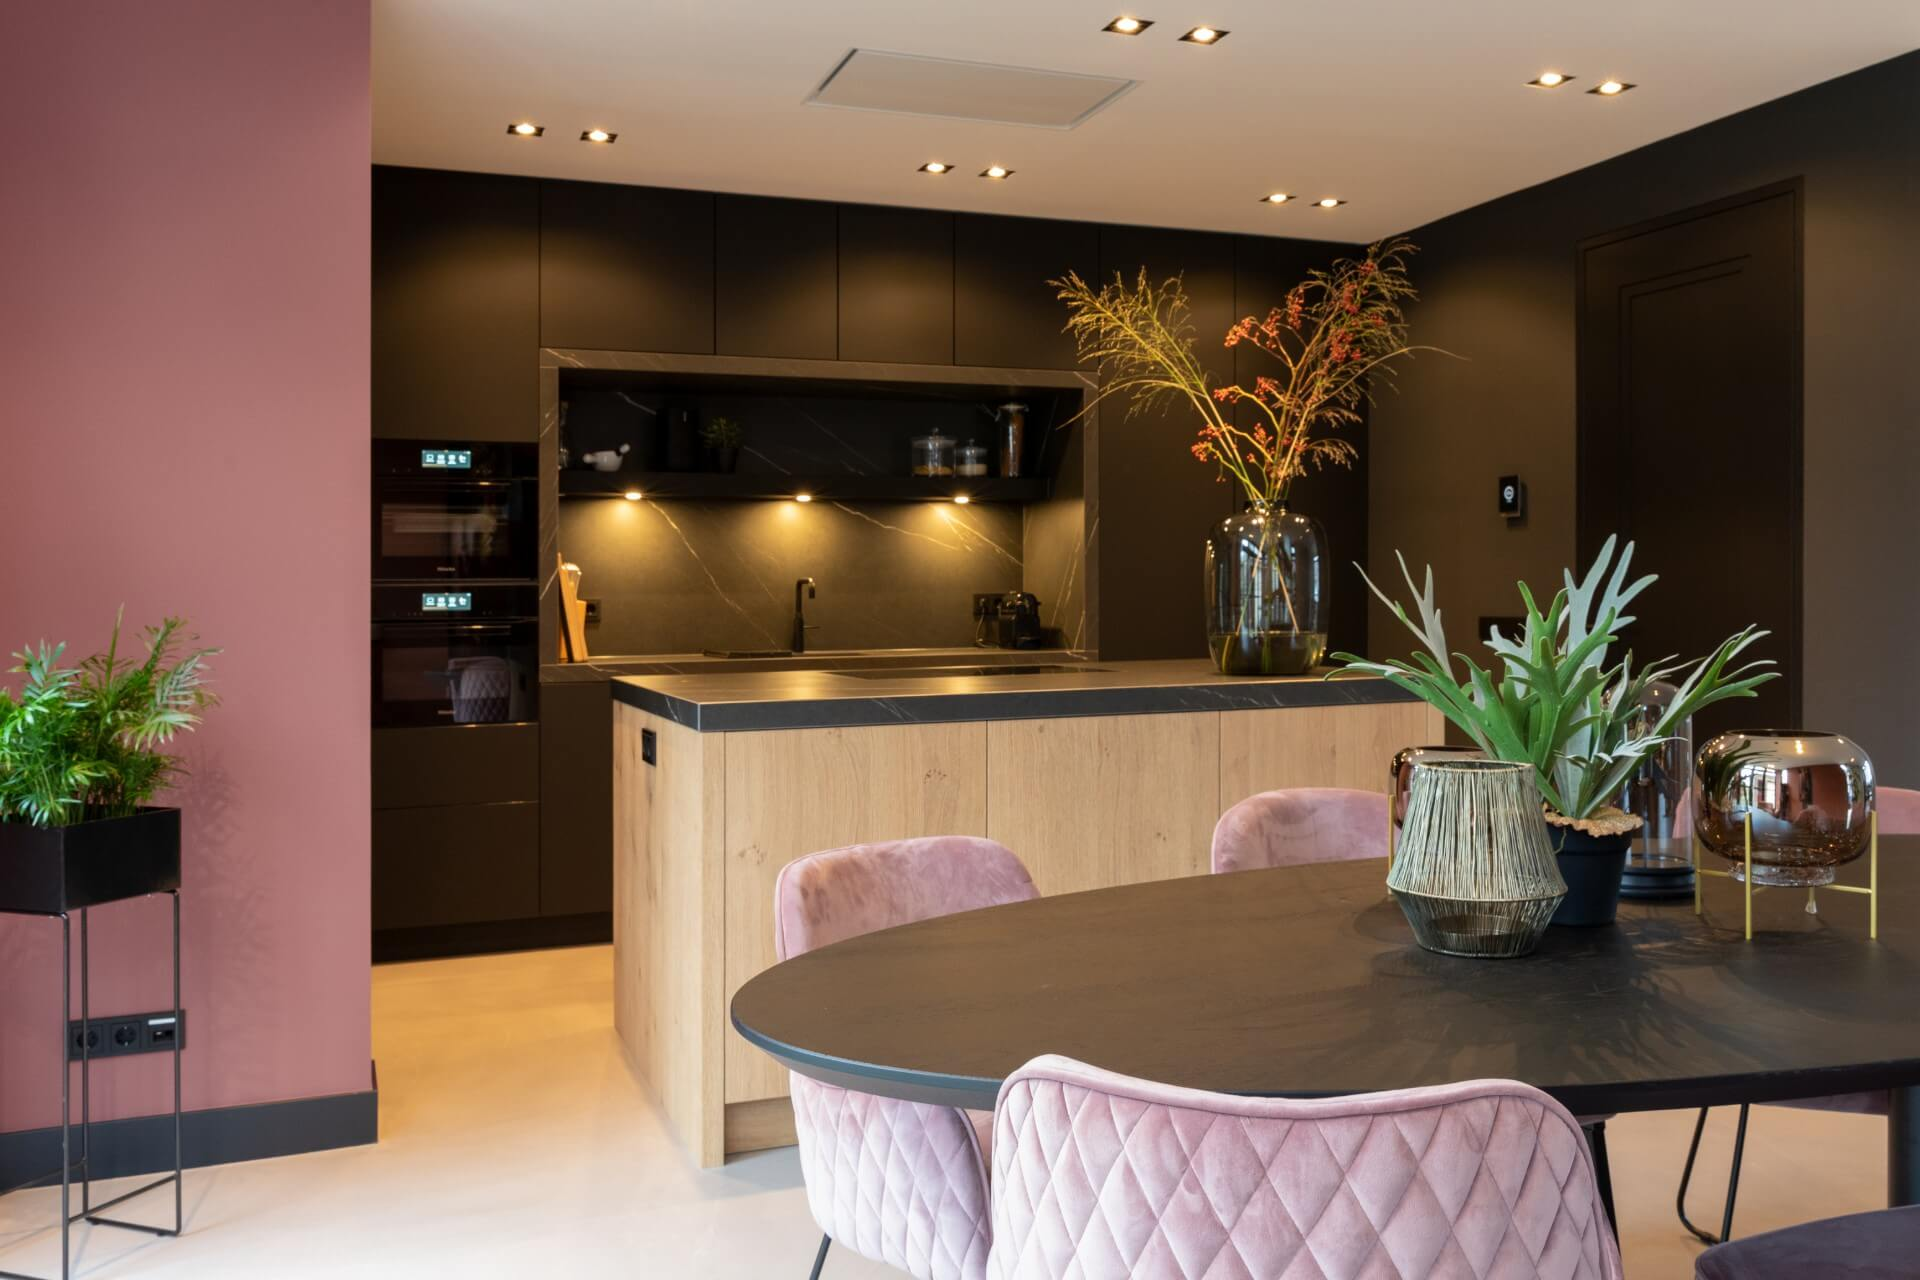 Fenix mat zwarte keuken met Miele apparatuur | Barneveld